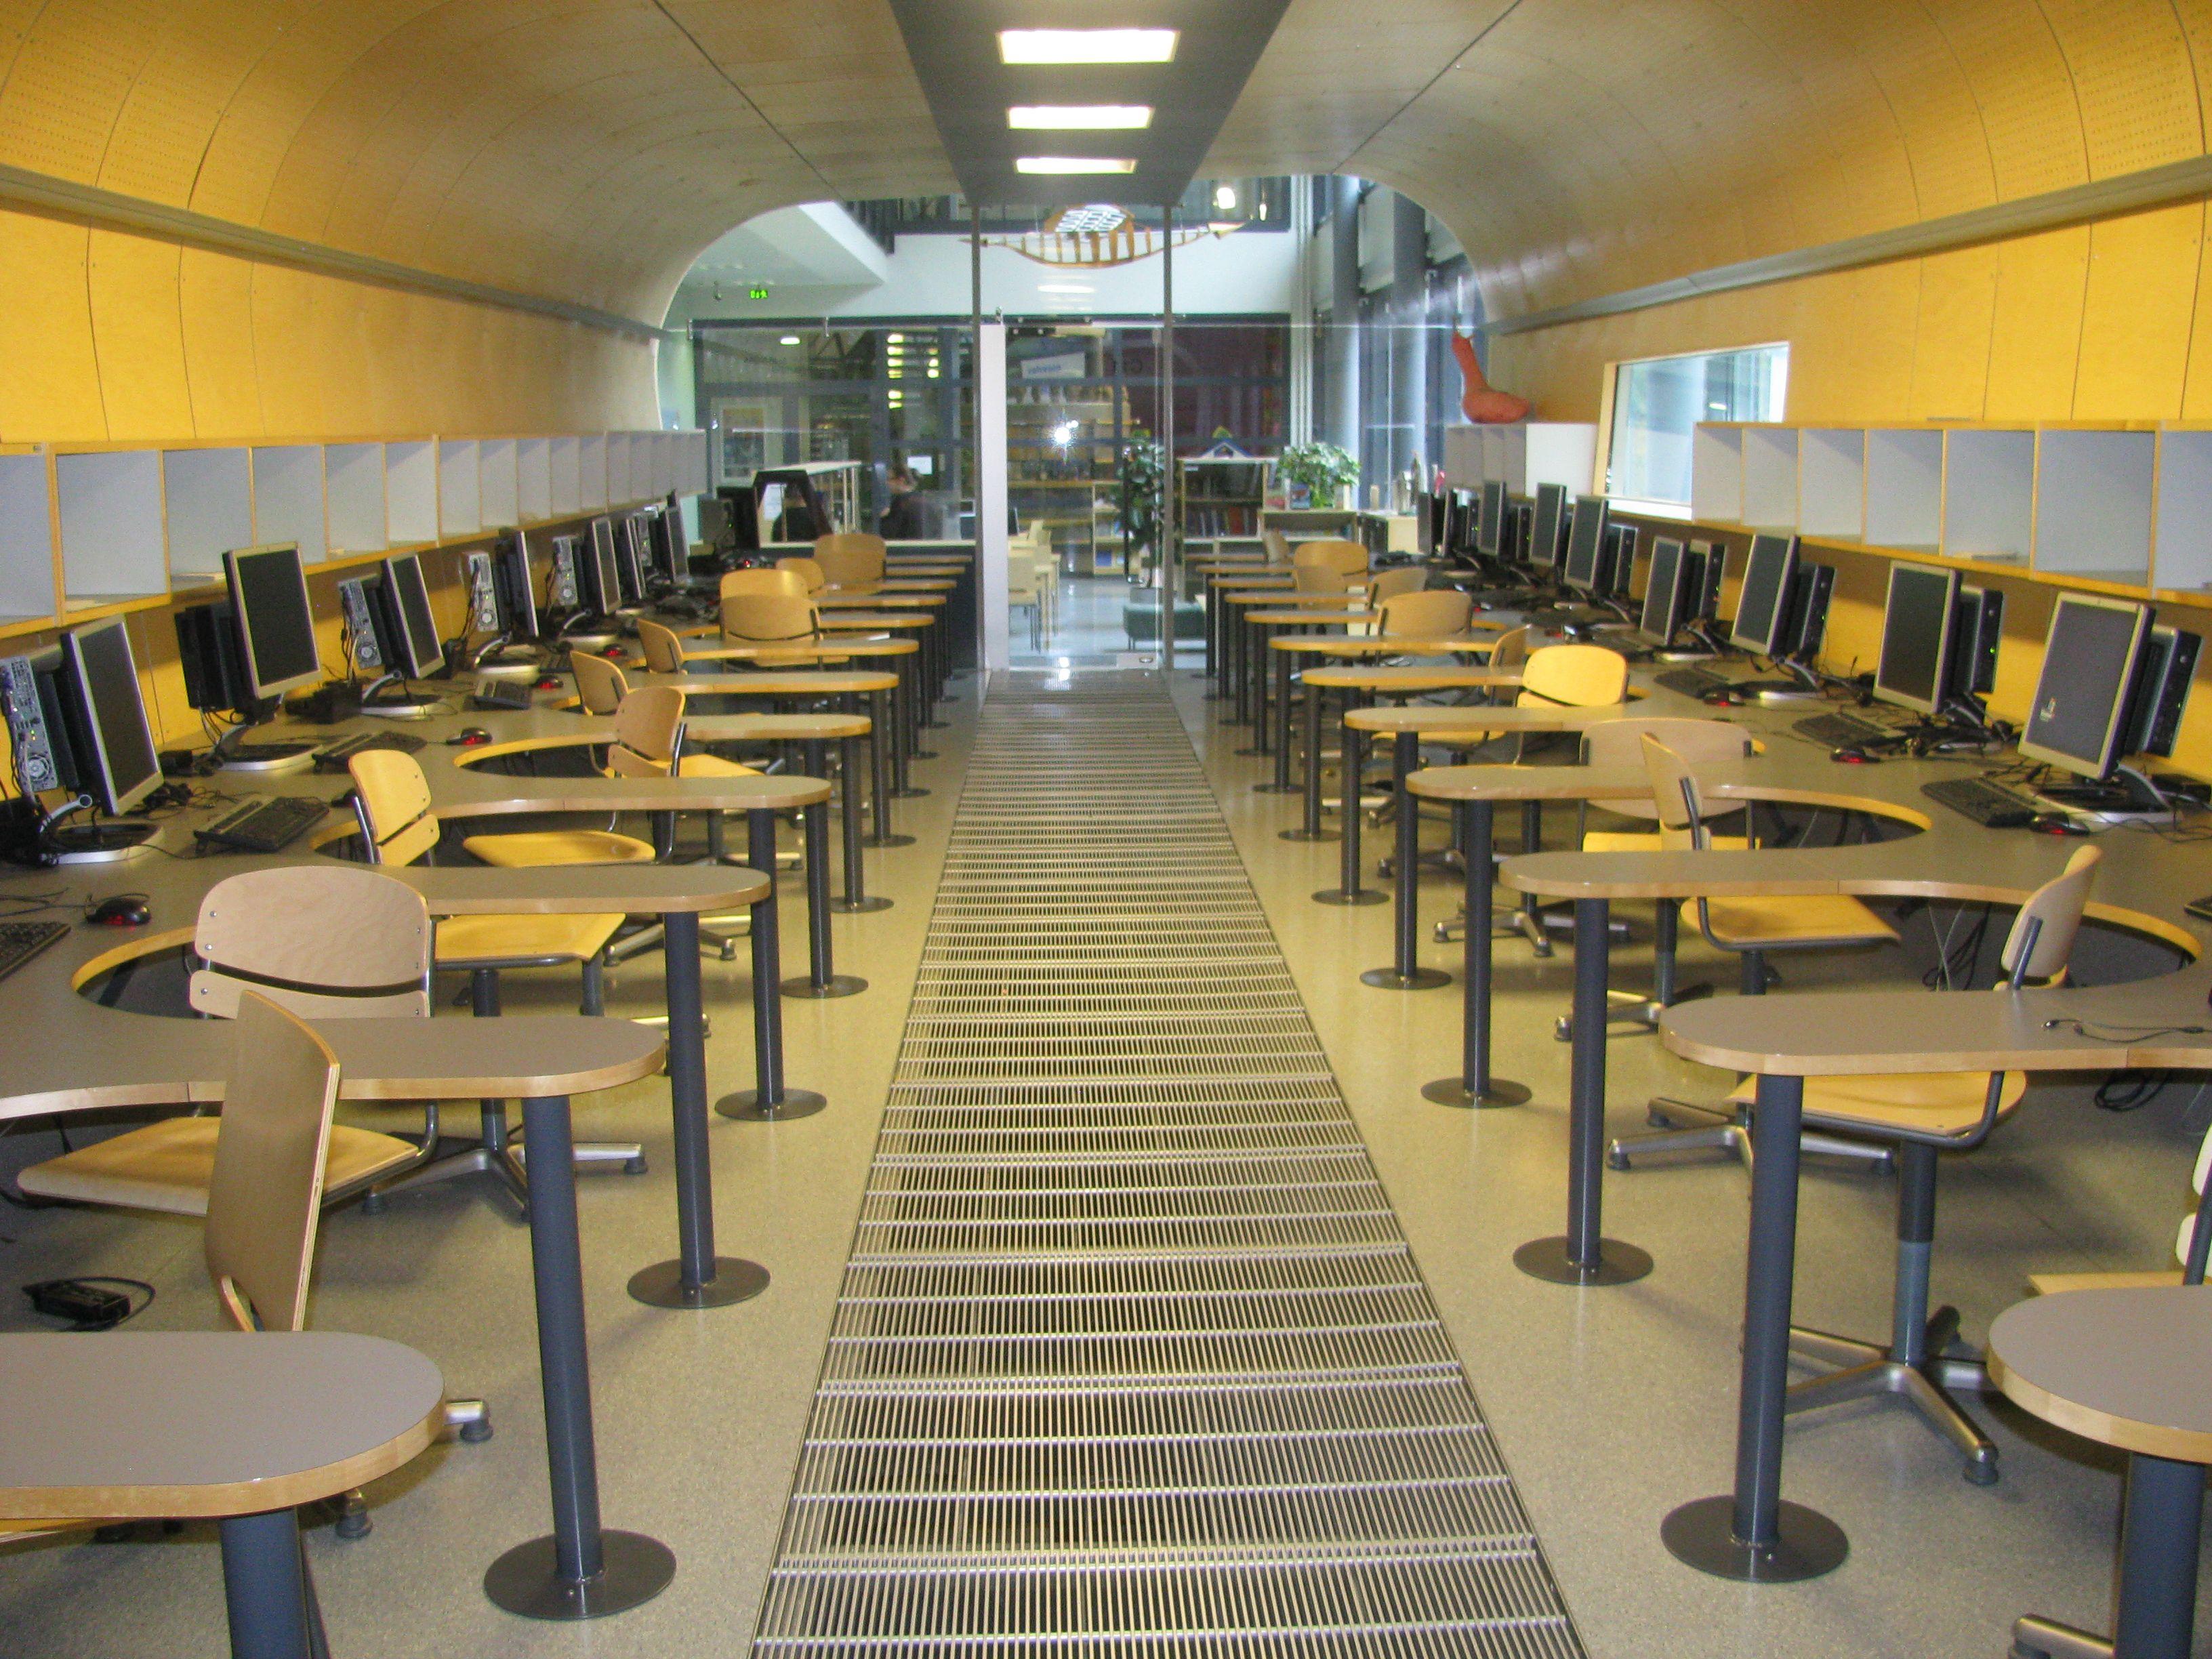 The inside of the kursk computer room at kaakkuri school